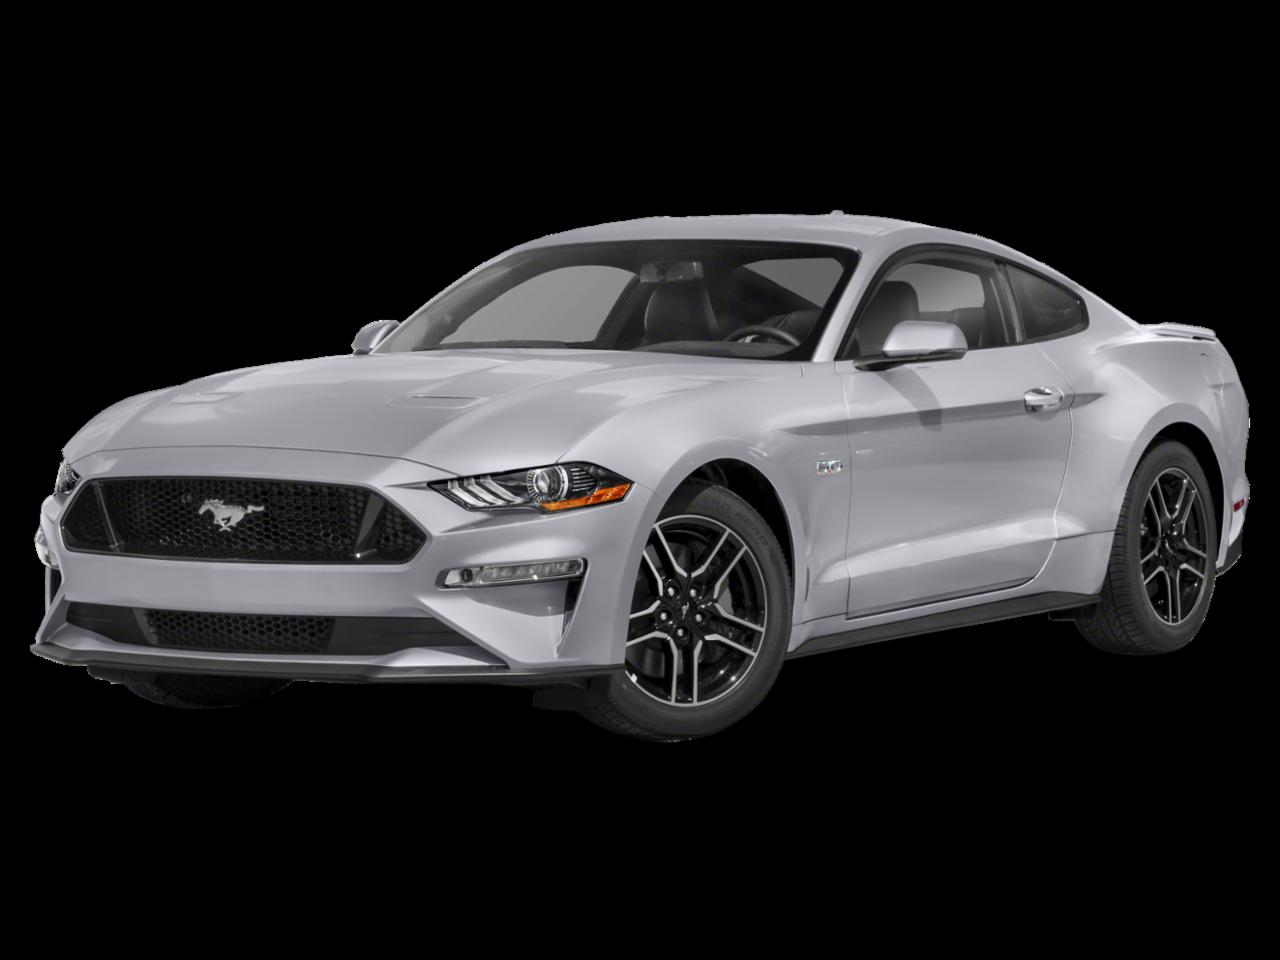 2021 Ford Mustang GT Premium 2dr Car